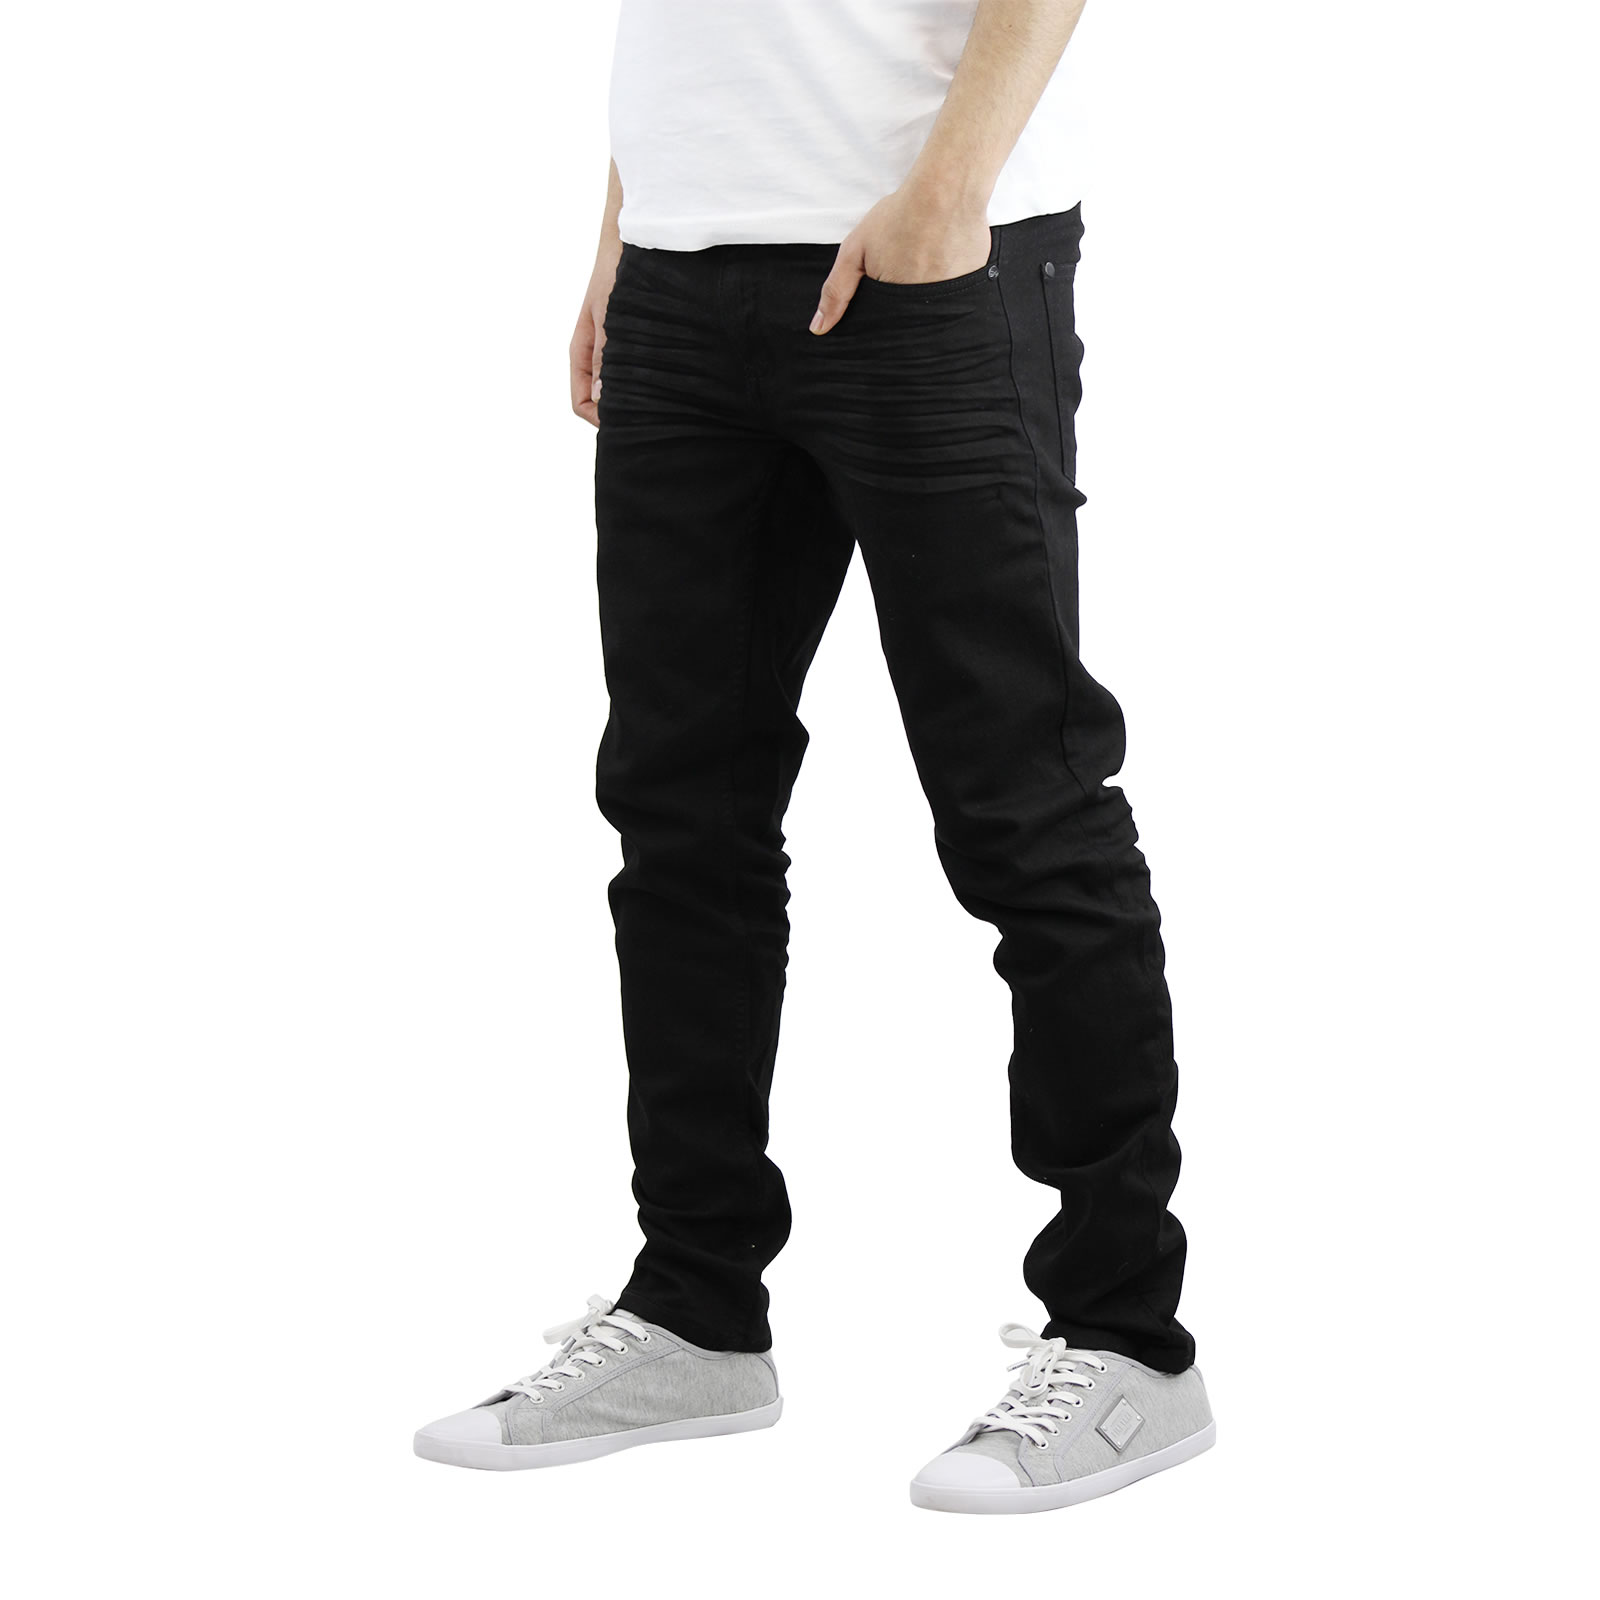 miniature 3 - Homme-Crosshatch-Jaco-Slim-Jeans-stretch-pantalon-denim-effet-vieilli